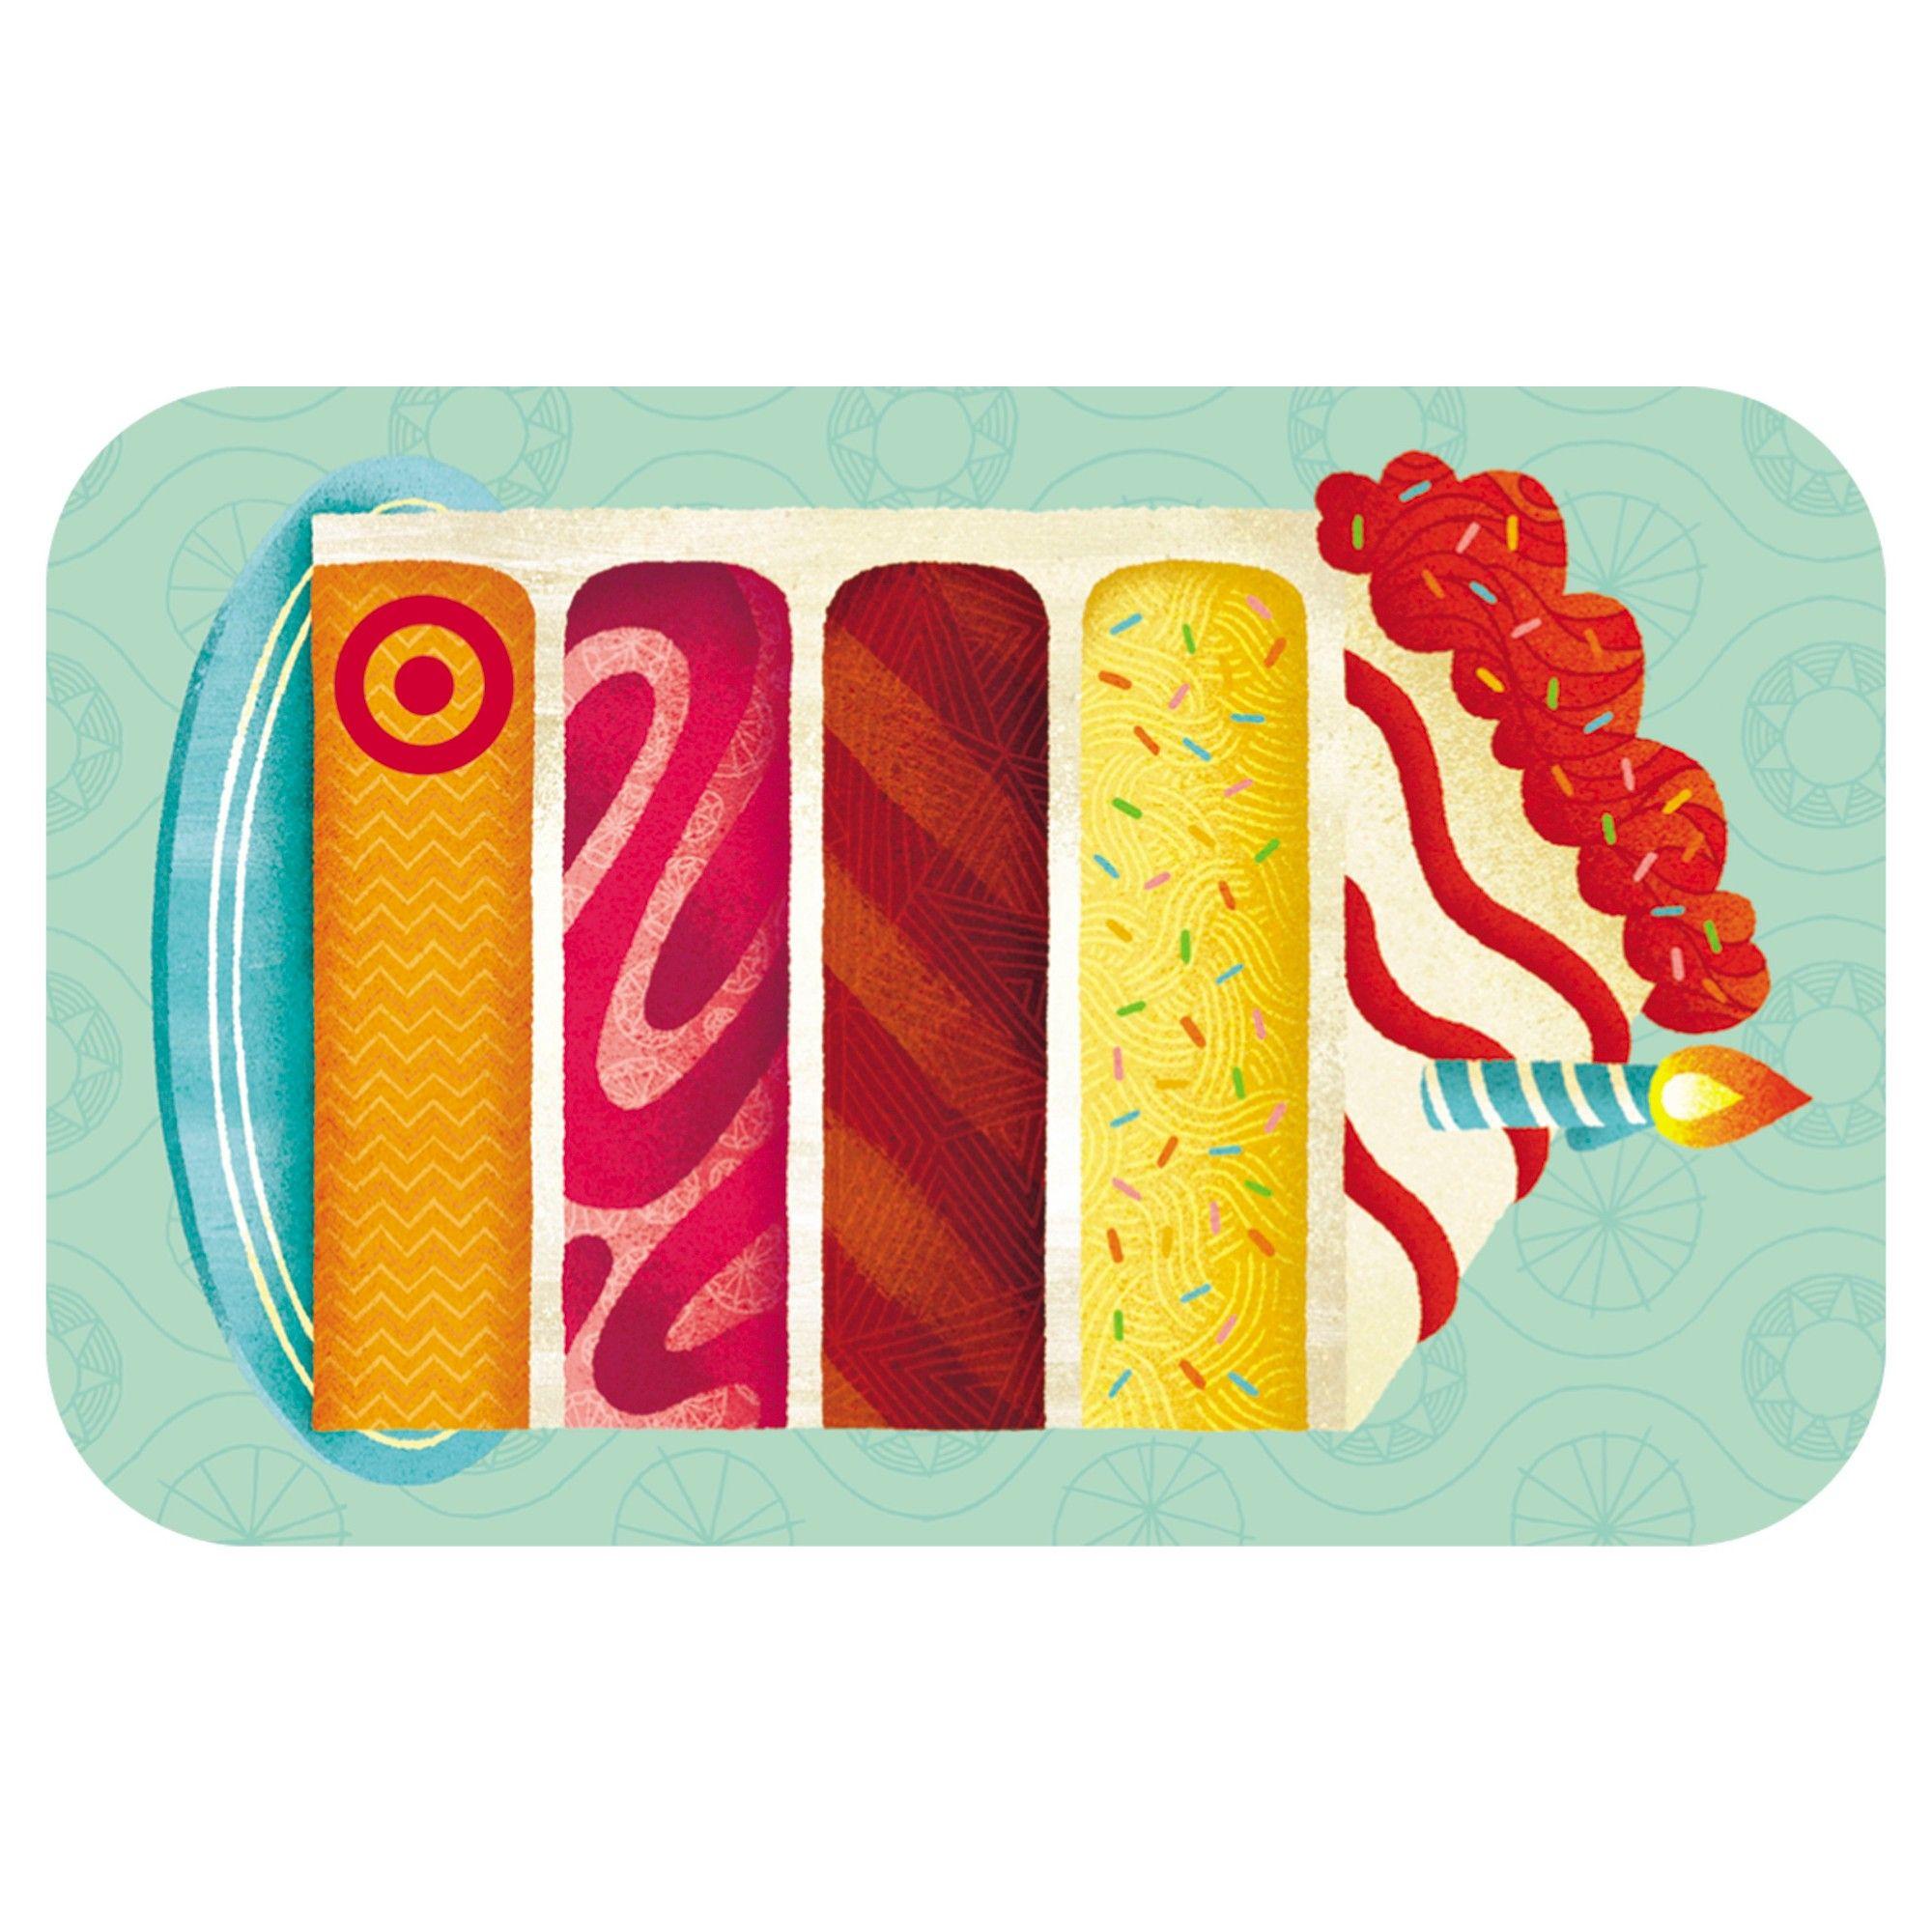 Bday cake slice giftcard 1000 buy birthday cake